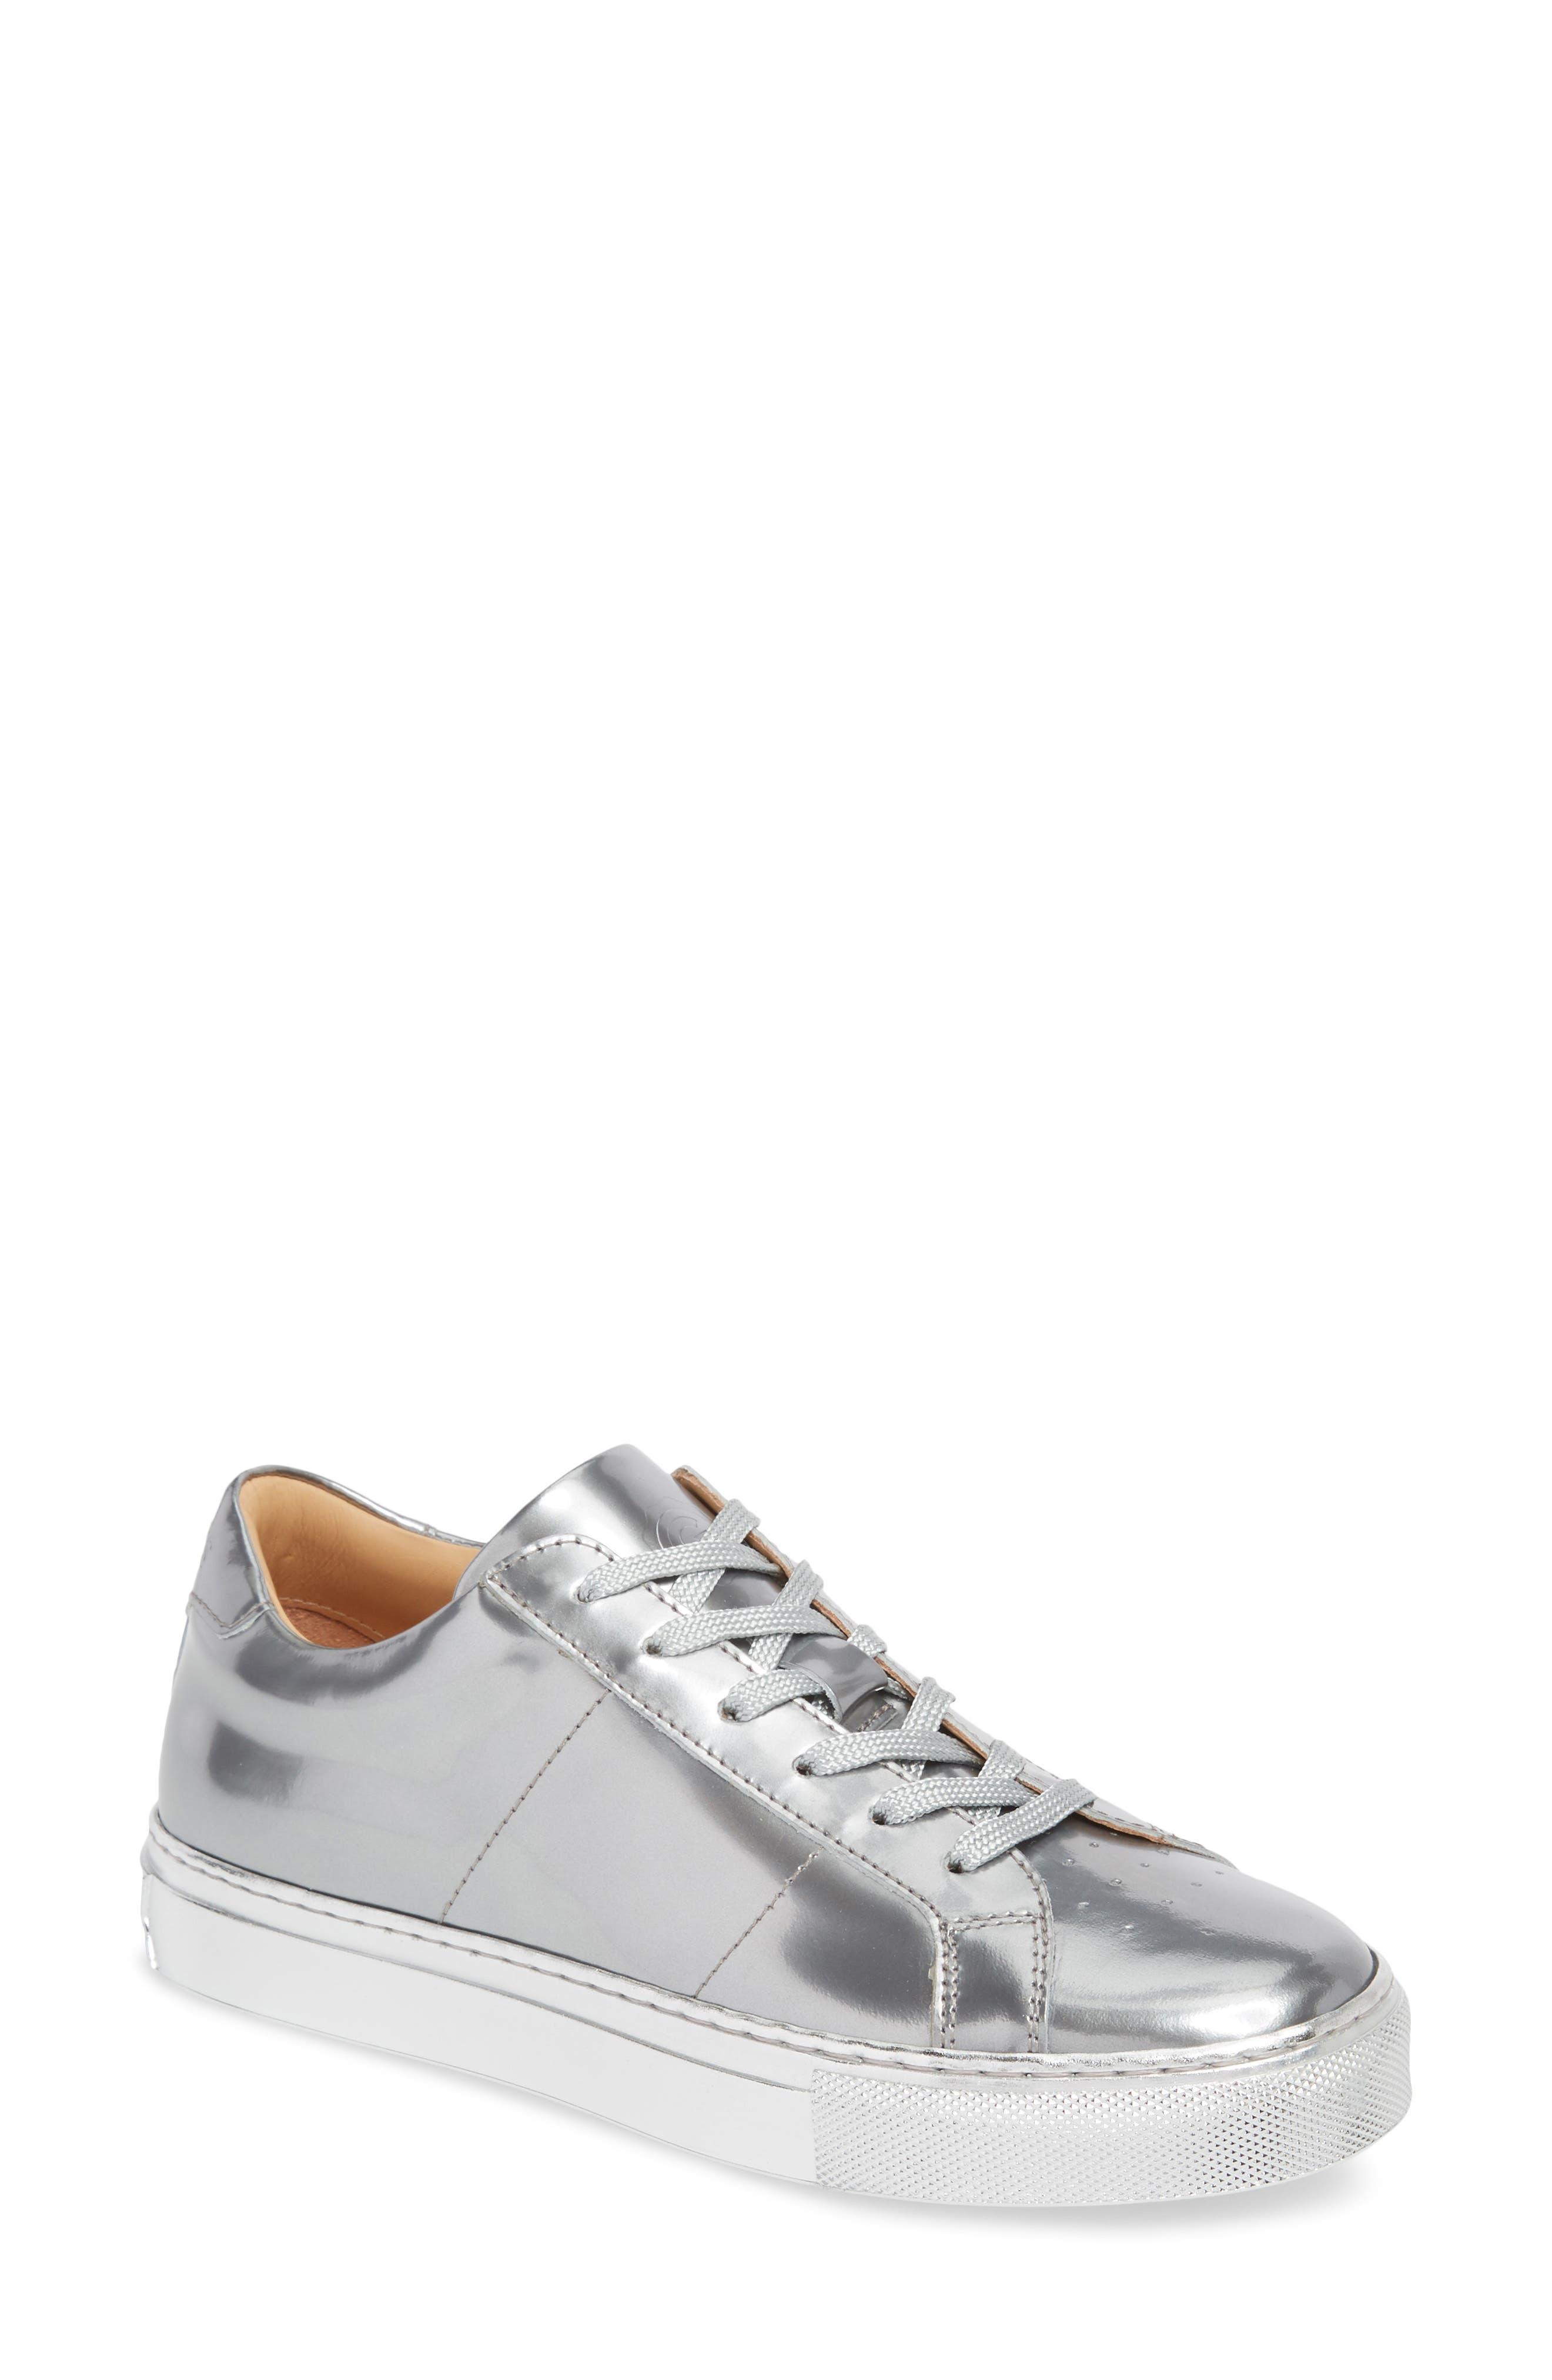 Royale Low Top Sneaker,                             Main thumbnail 1, color,                             Silver Tonal/ Flat Leather